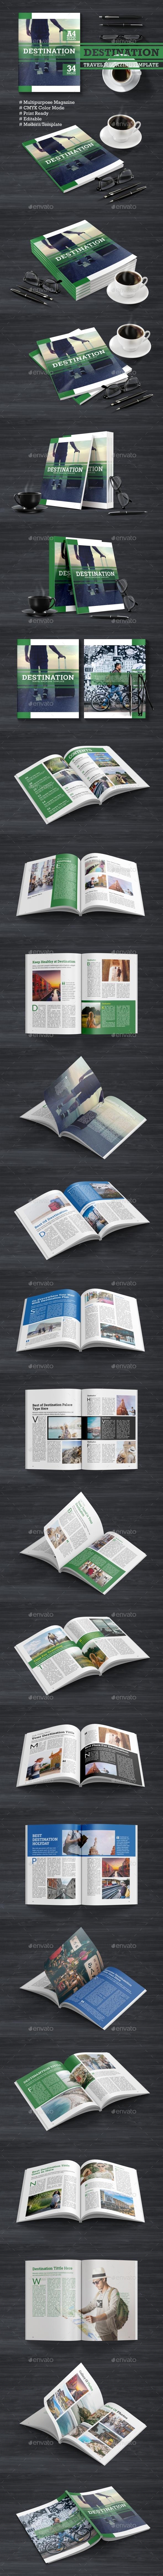 Destination - Travel Magazine - Magazines Print Templates